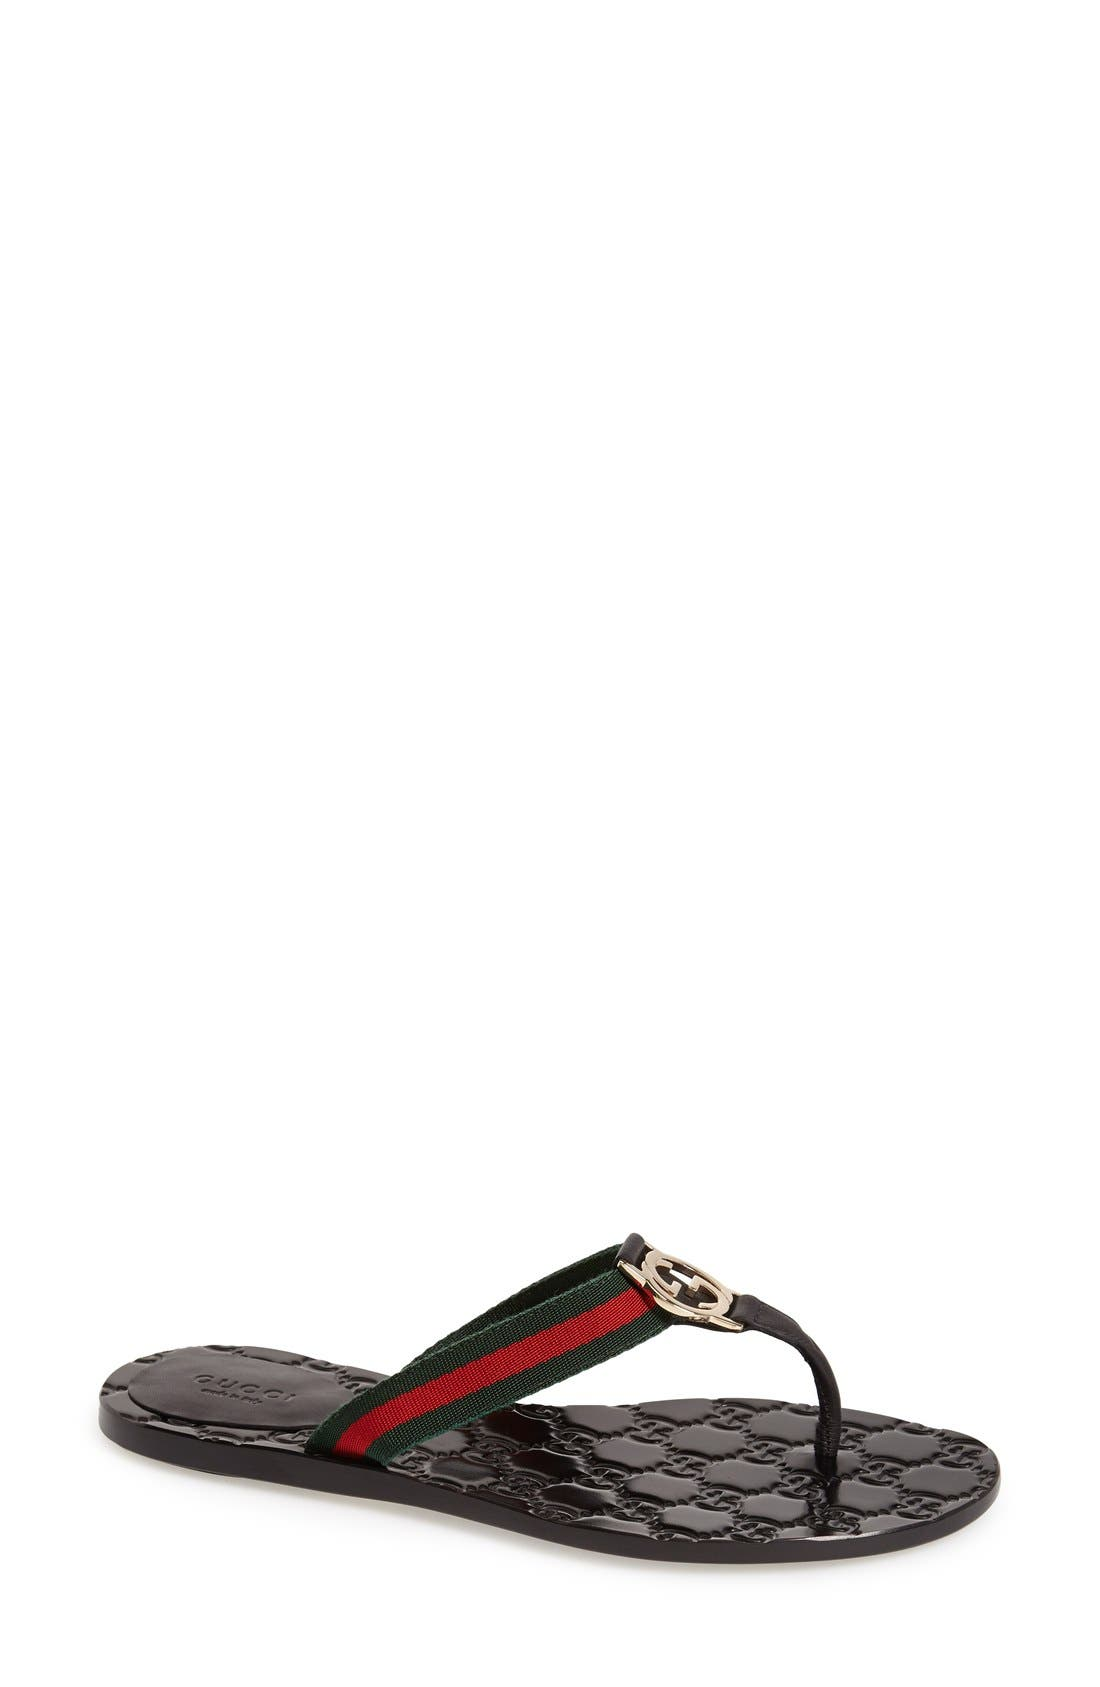 'GG' Logo Sandal,                             Main thumbnail 1, color,                             Nero